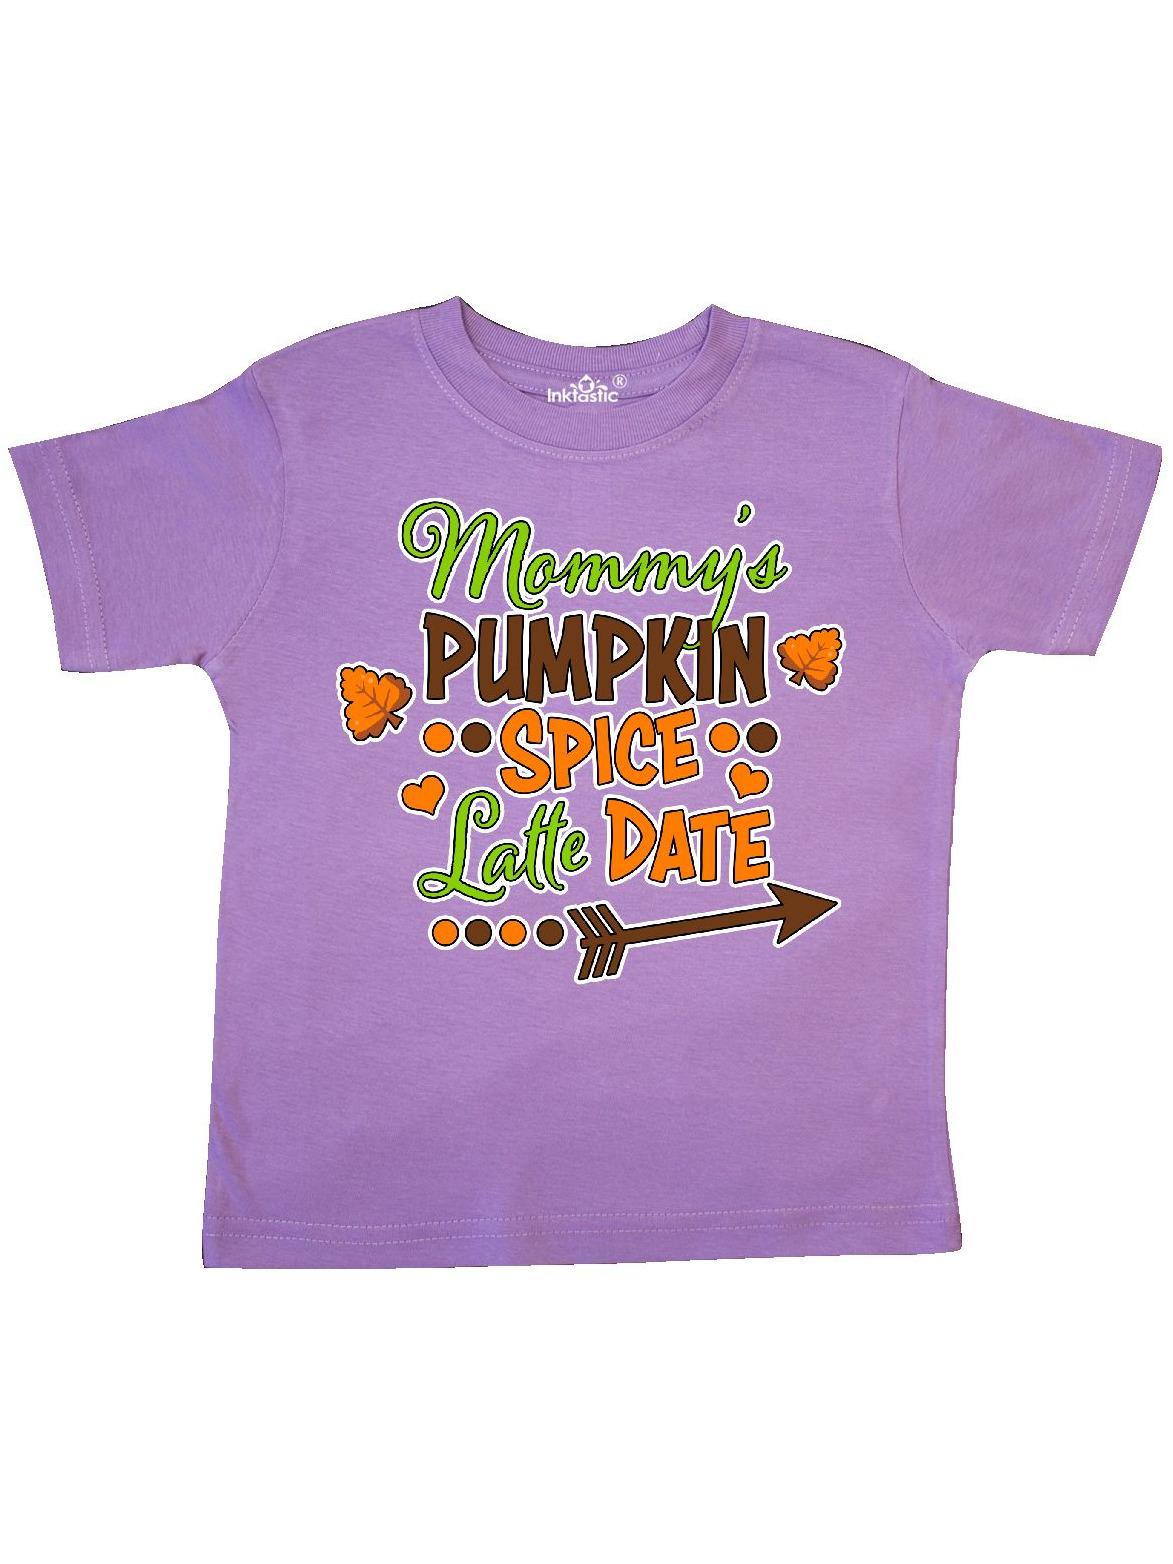 Mommy/'s Pumpkin Spice Latte Date Mommys Mini Pumpkin Spice Latte Baby Pumpkin Spice Pumpkin Spice Latte Shirt Pumpkin Spice Shirt